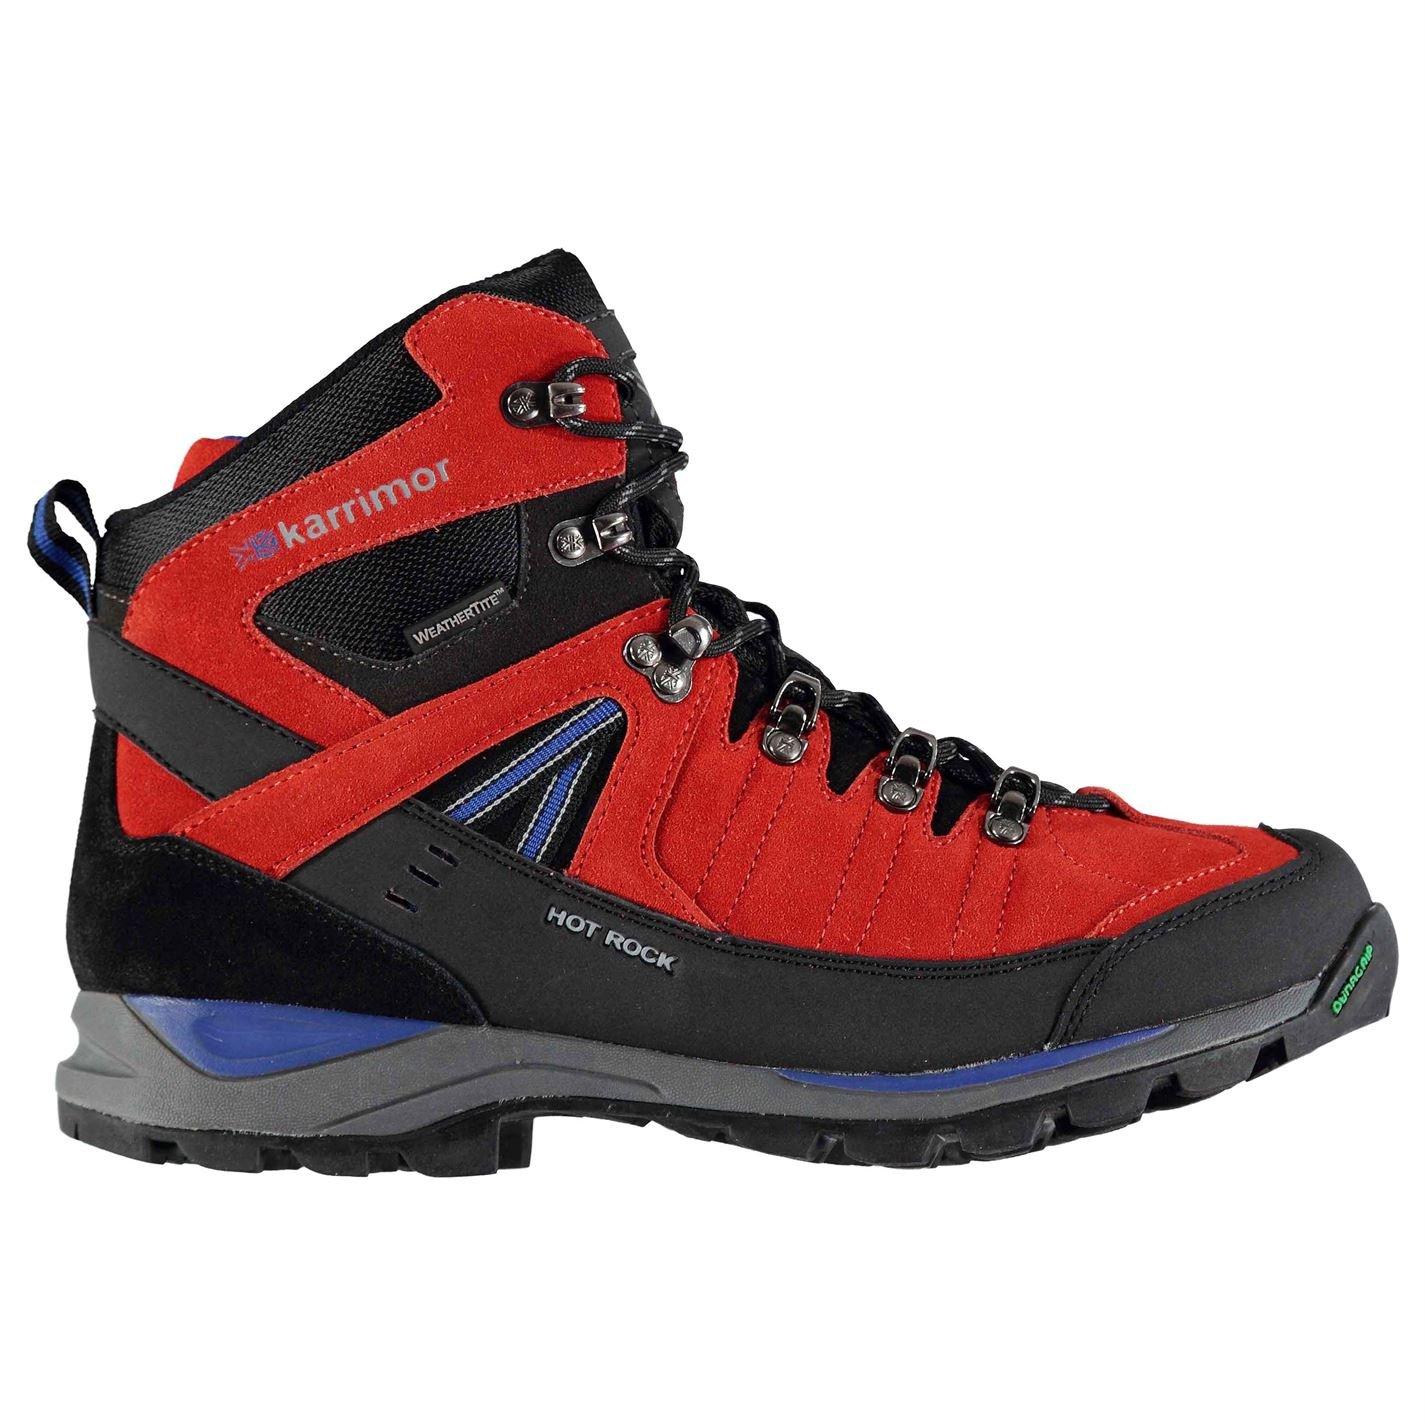 9e7f5b7b346 Karrimor Mens Hot Rock Mid Walking Boot